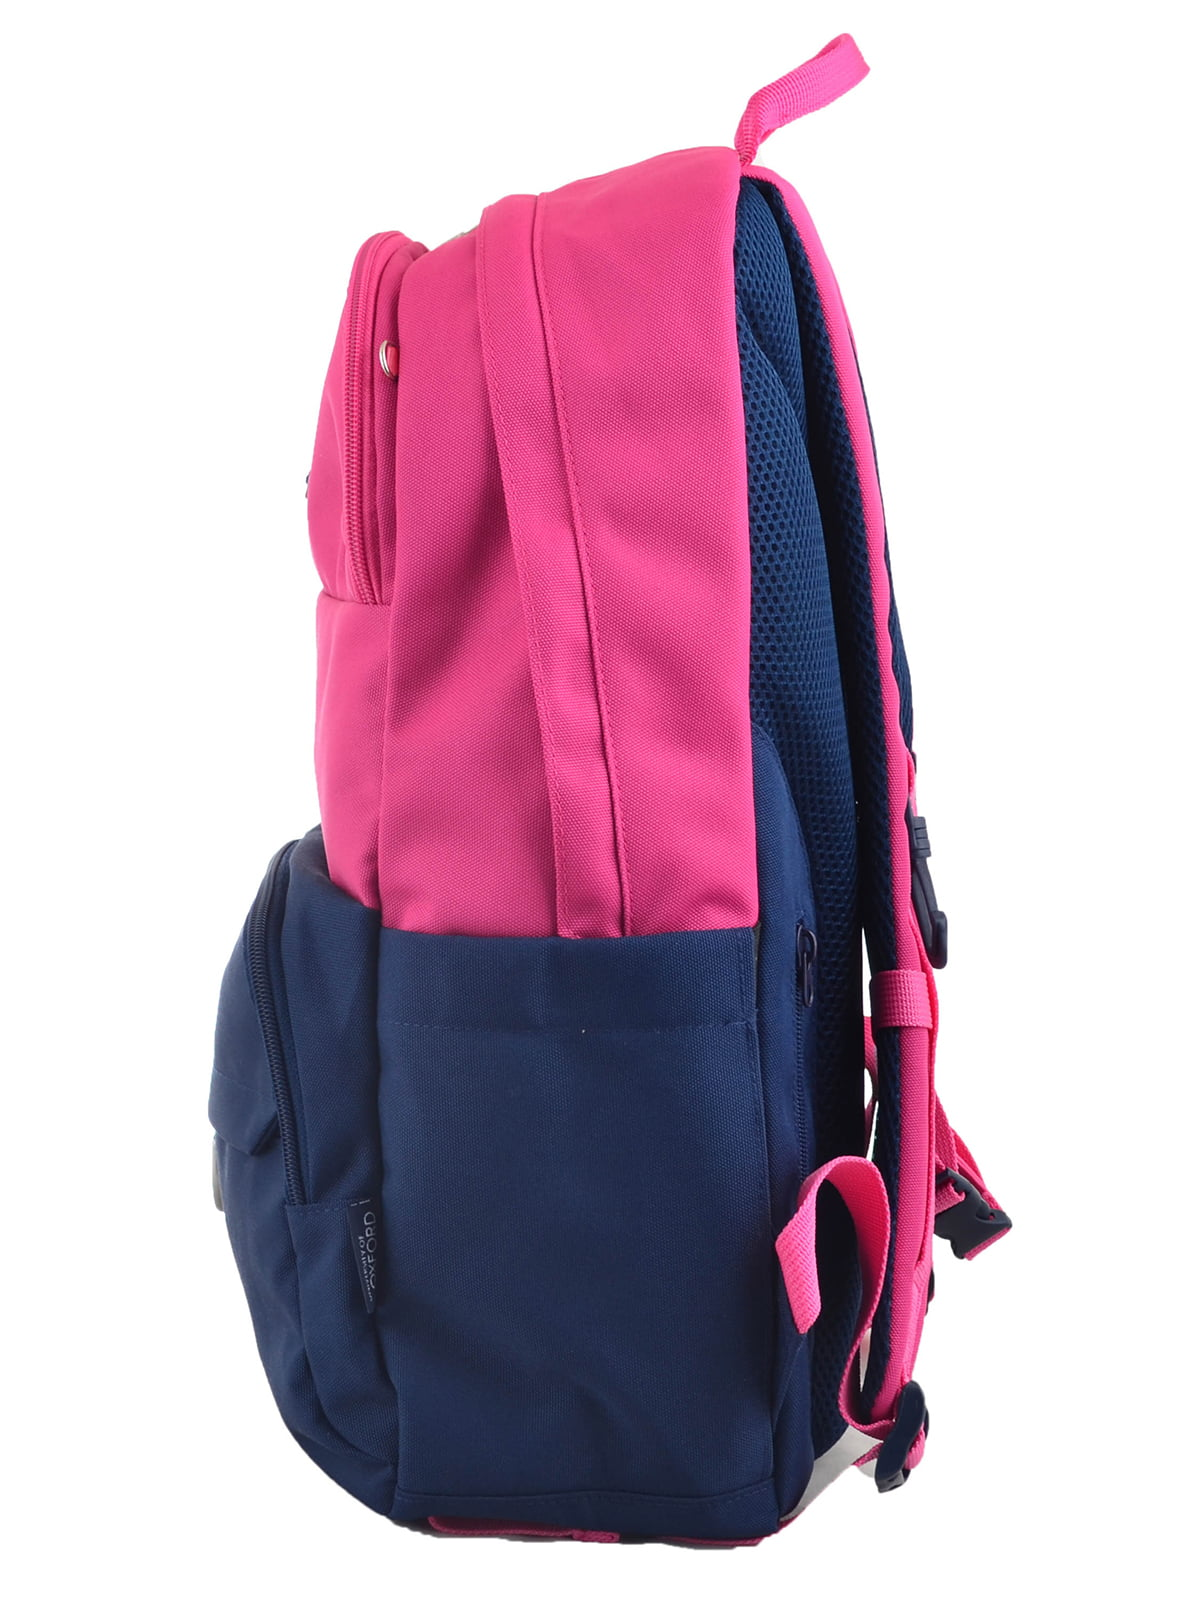 Рюкзак синьо-рожевий | 4214891 | фото 3